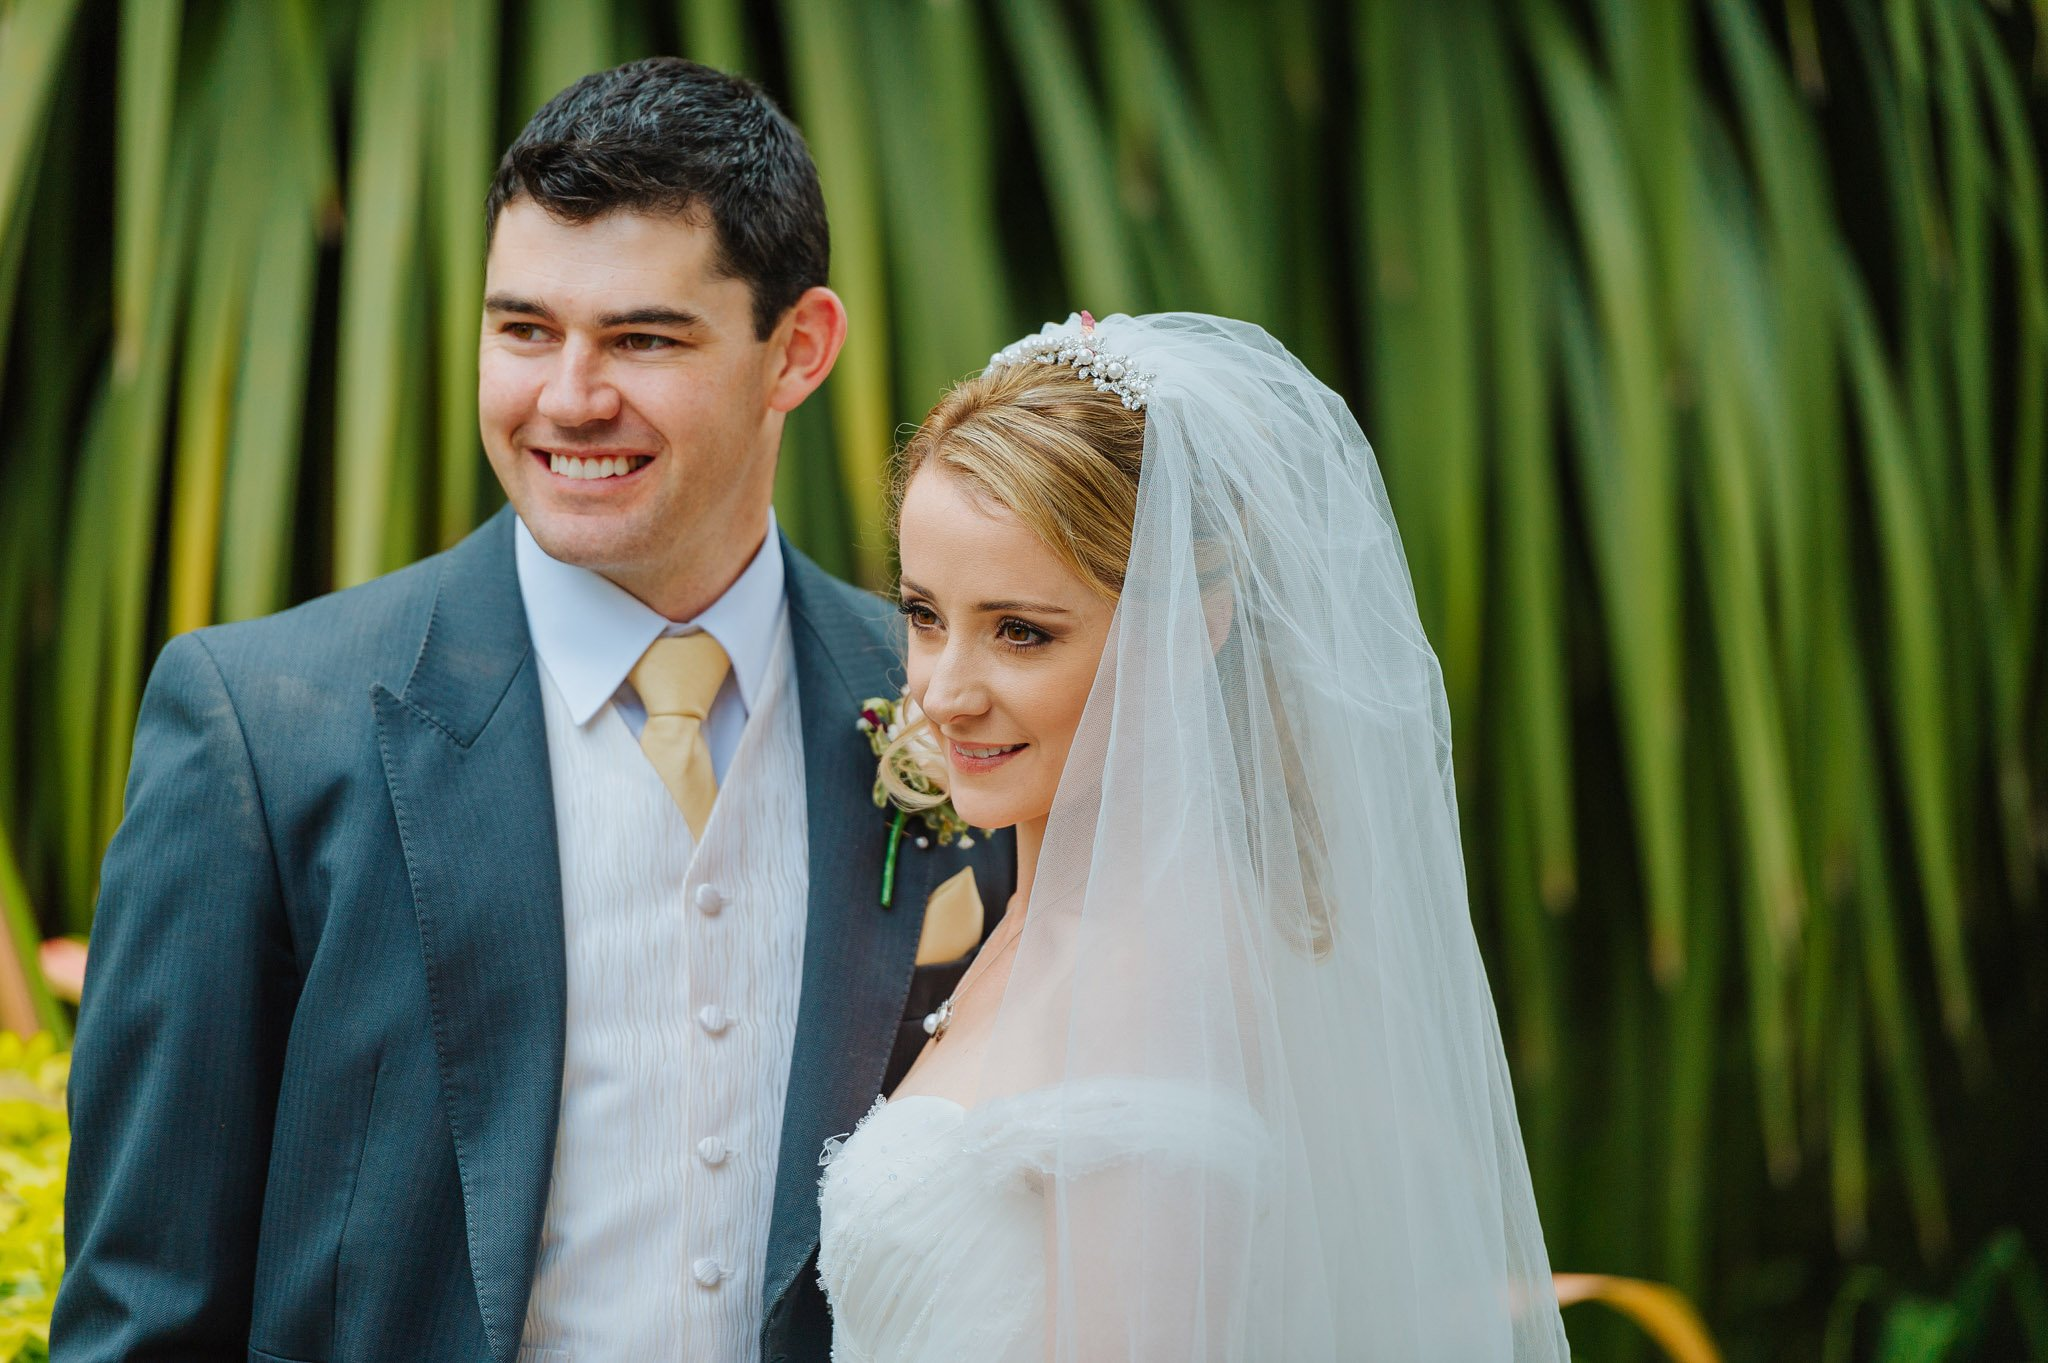 Georgina + Mike - Wedding photography in Malvern, Worcestershire 39